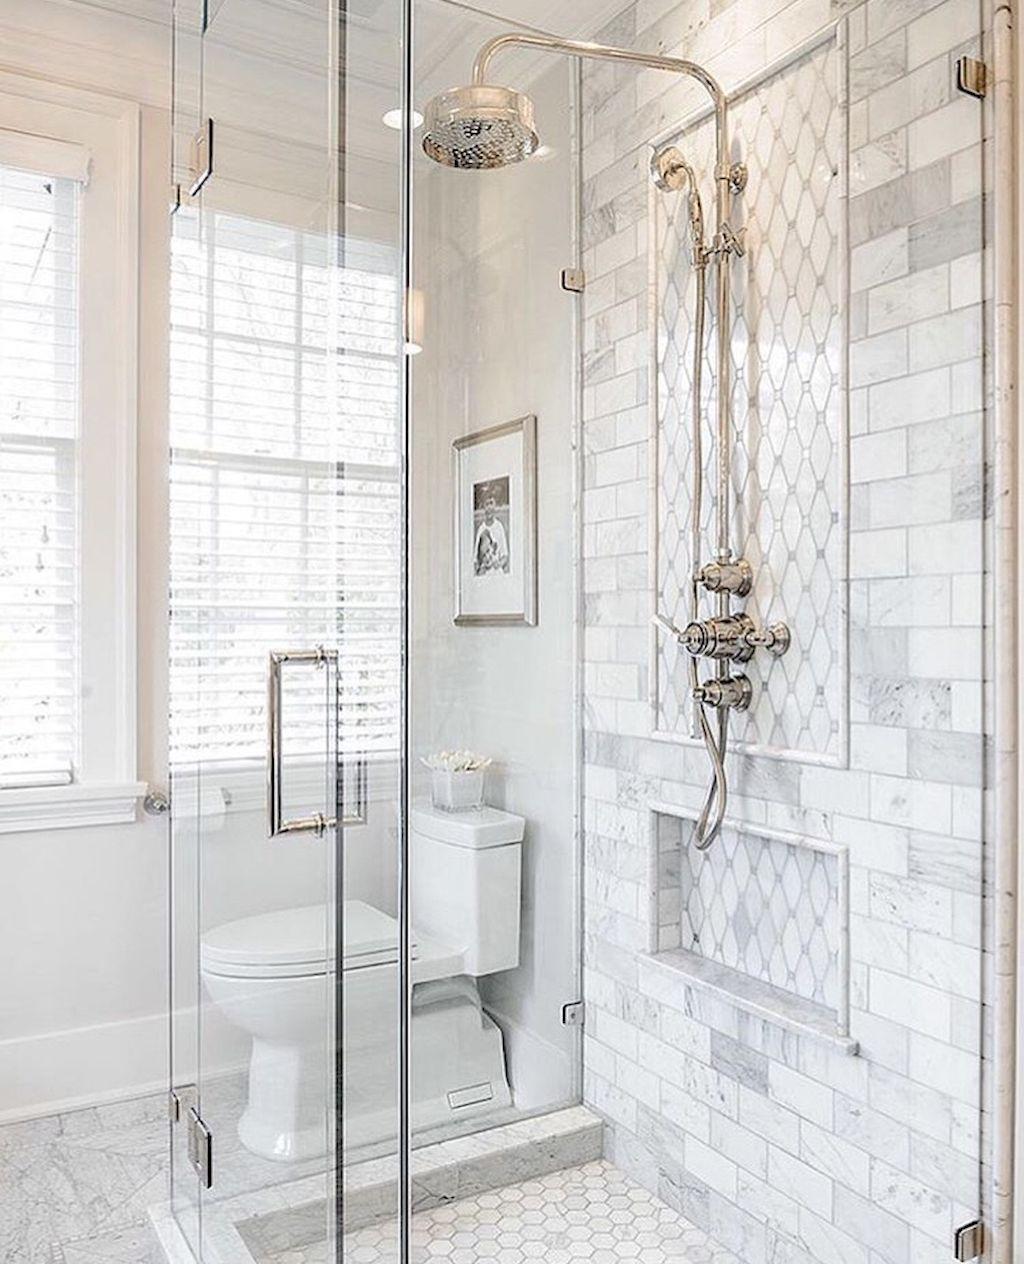 40 Beautiful Bathroom Shower Tile Design Ideas And Makeover 2 Bathroom Bathroom Bathroom Tile Designs